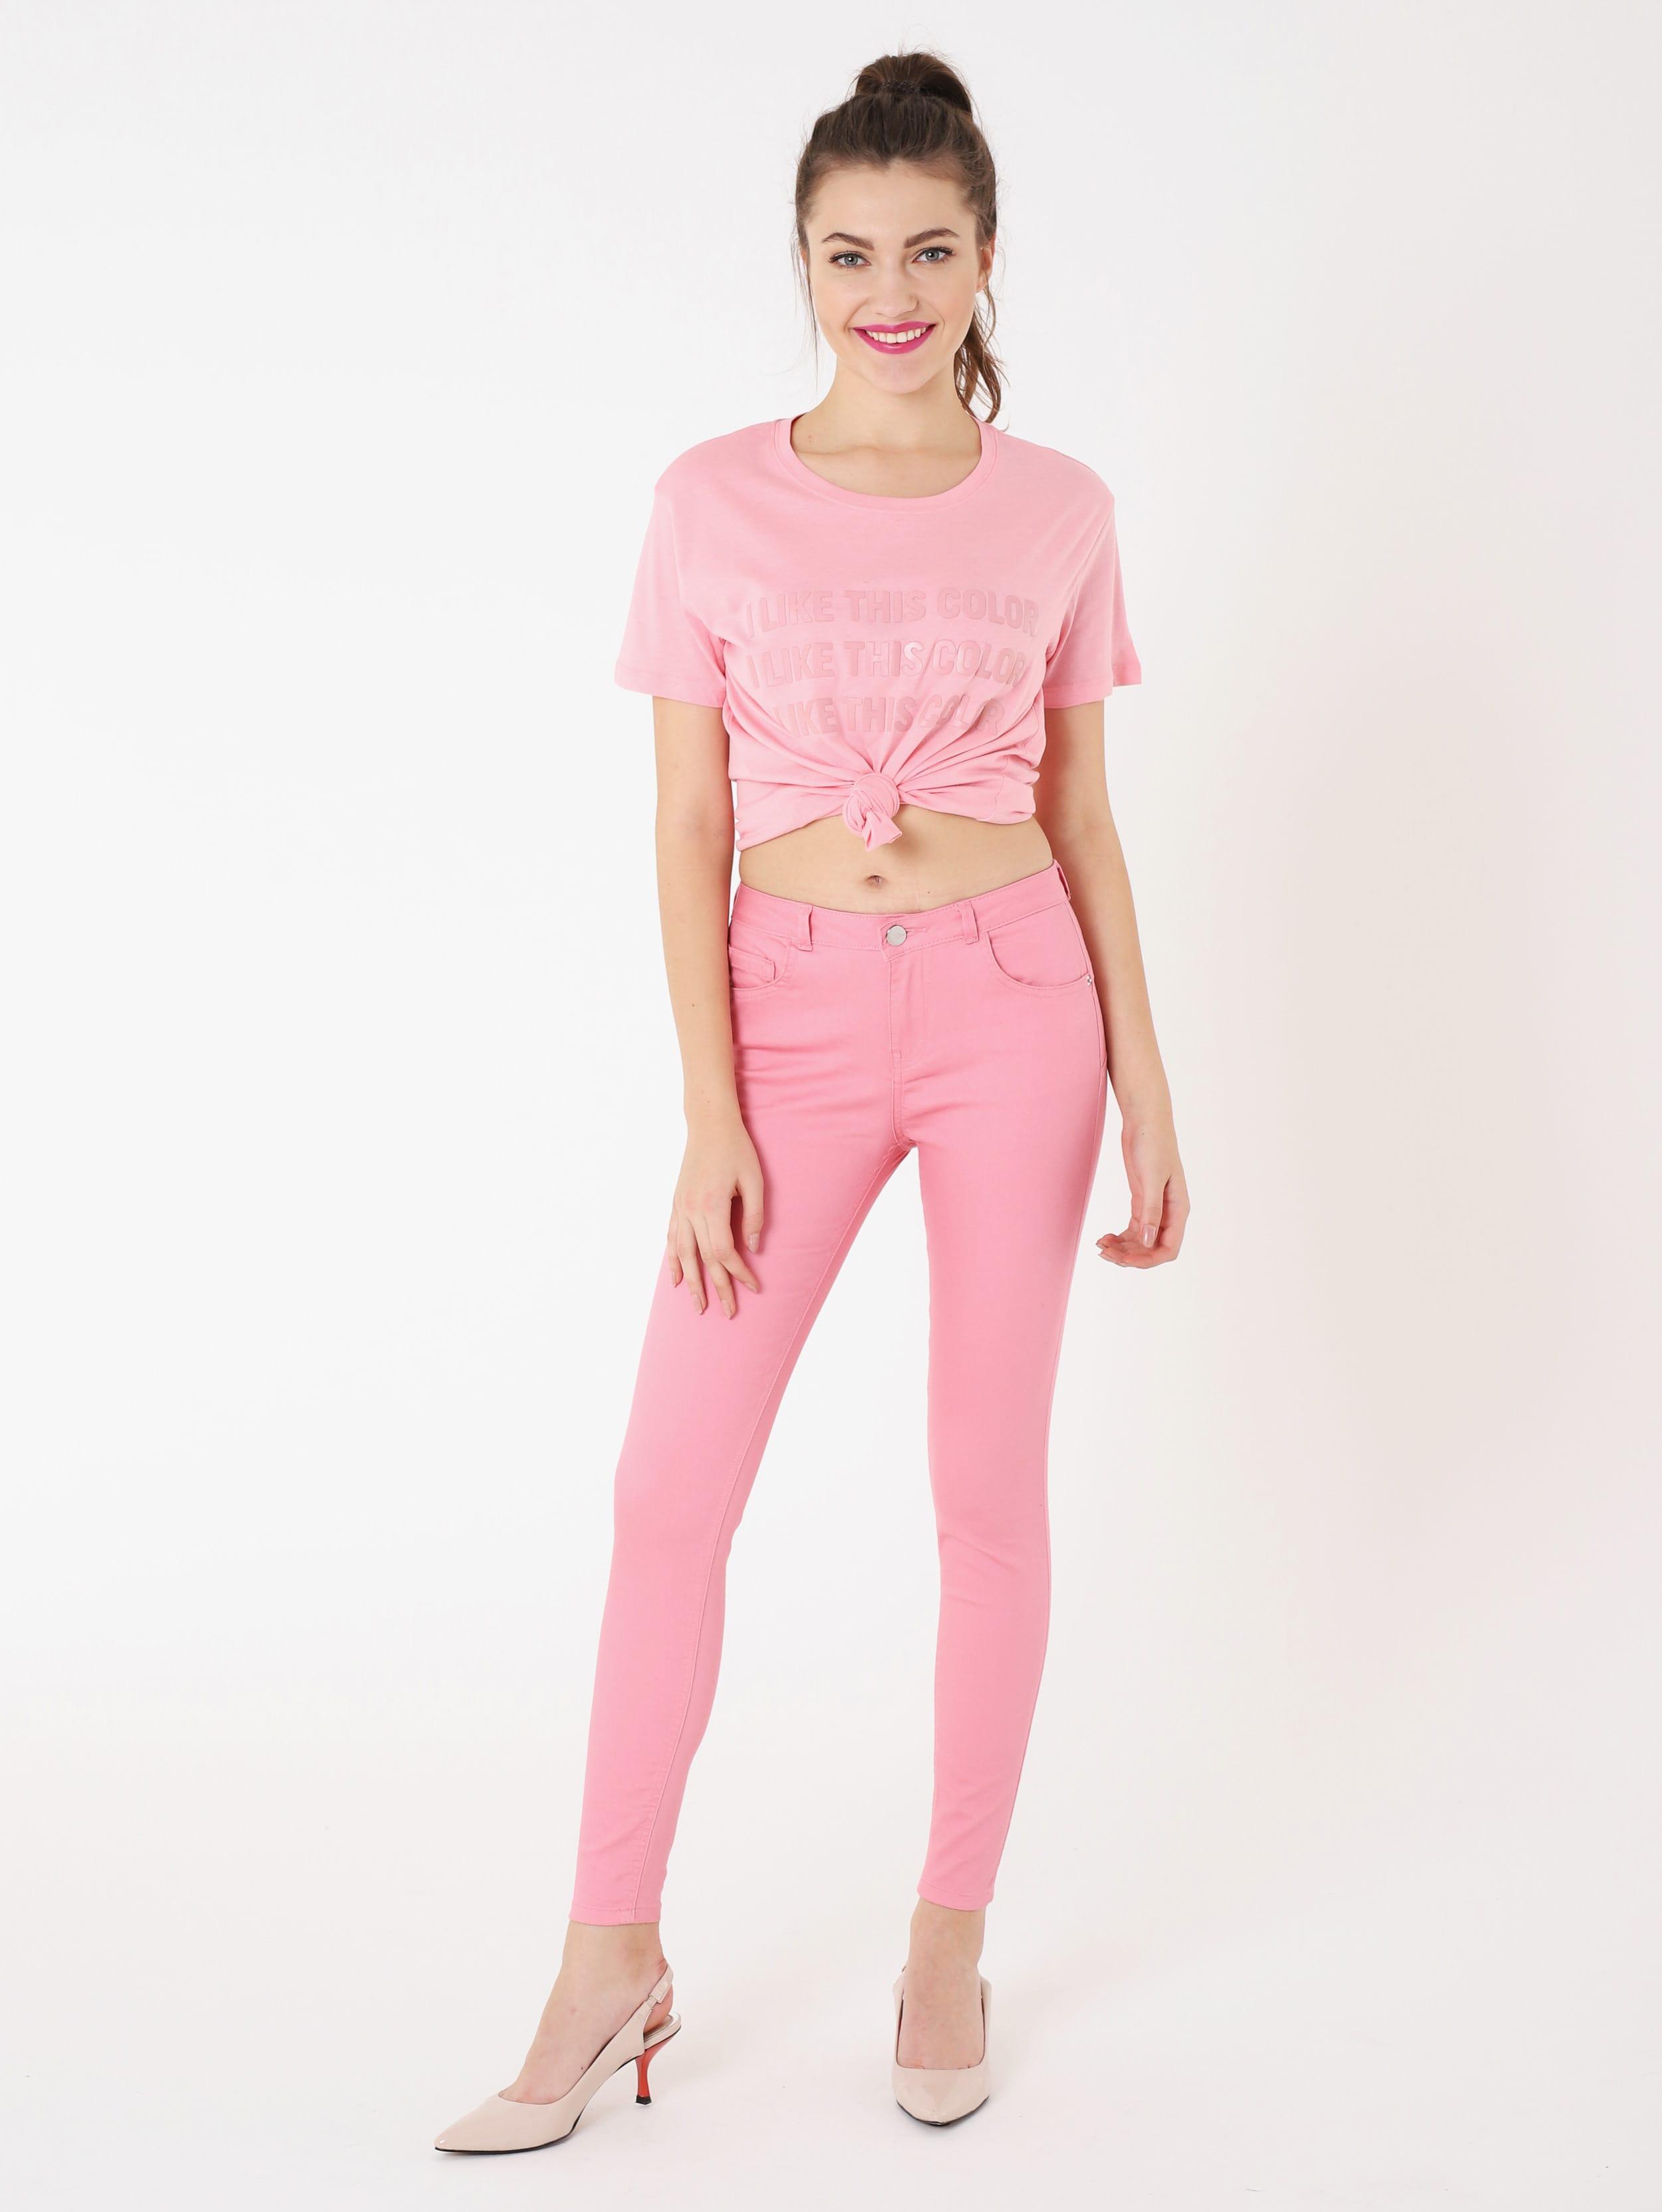 Pantaloni rosa Terranova a 17,99 euro